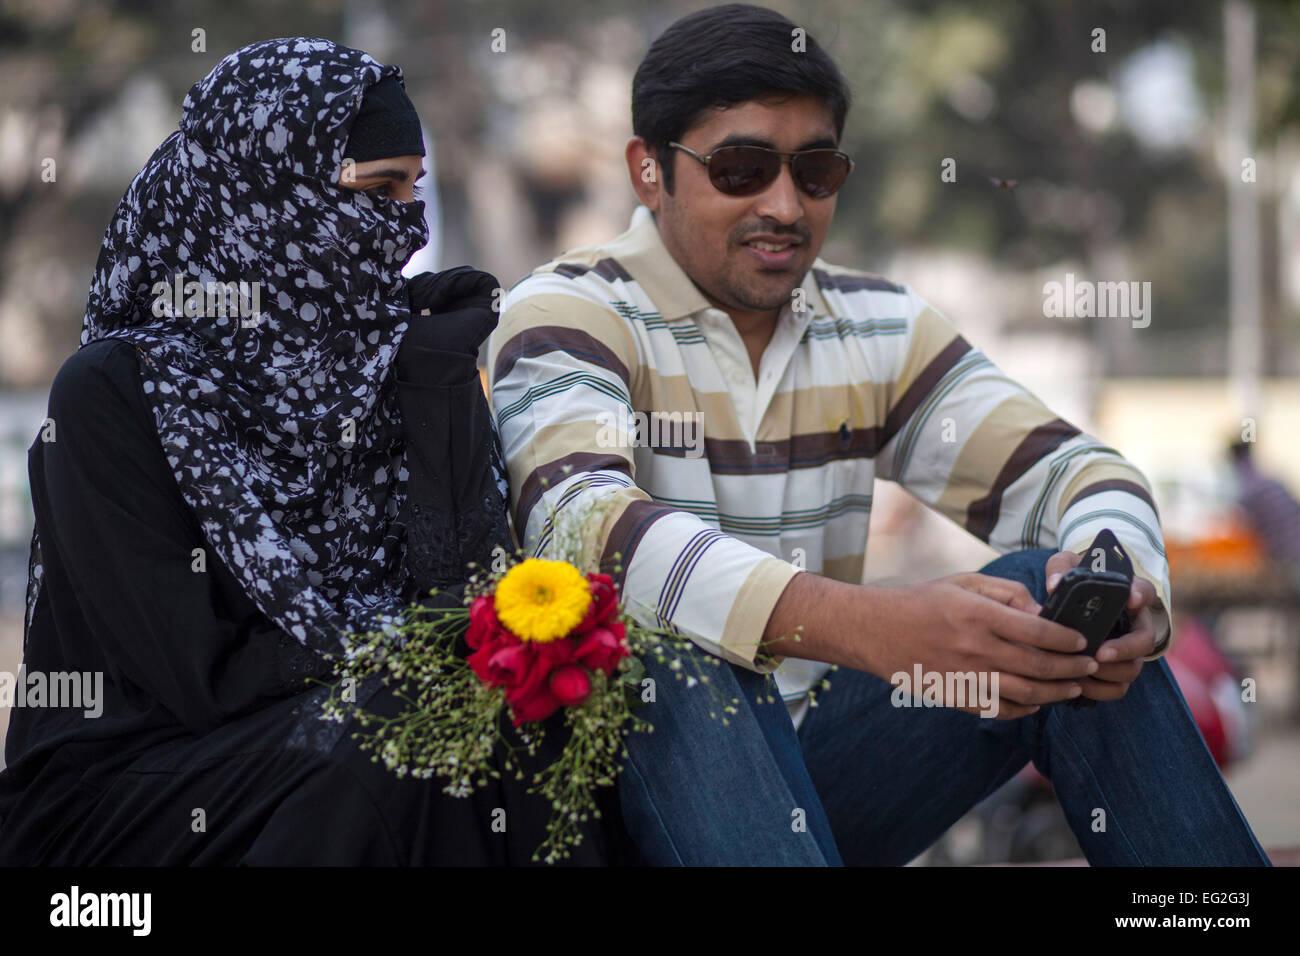 Dhaka bangladesh 14th feb 2015 a couple in a park to celebrate valentines day credit zakir hossain chowdhury zakir alamy live news